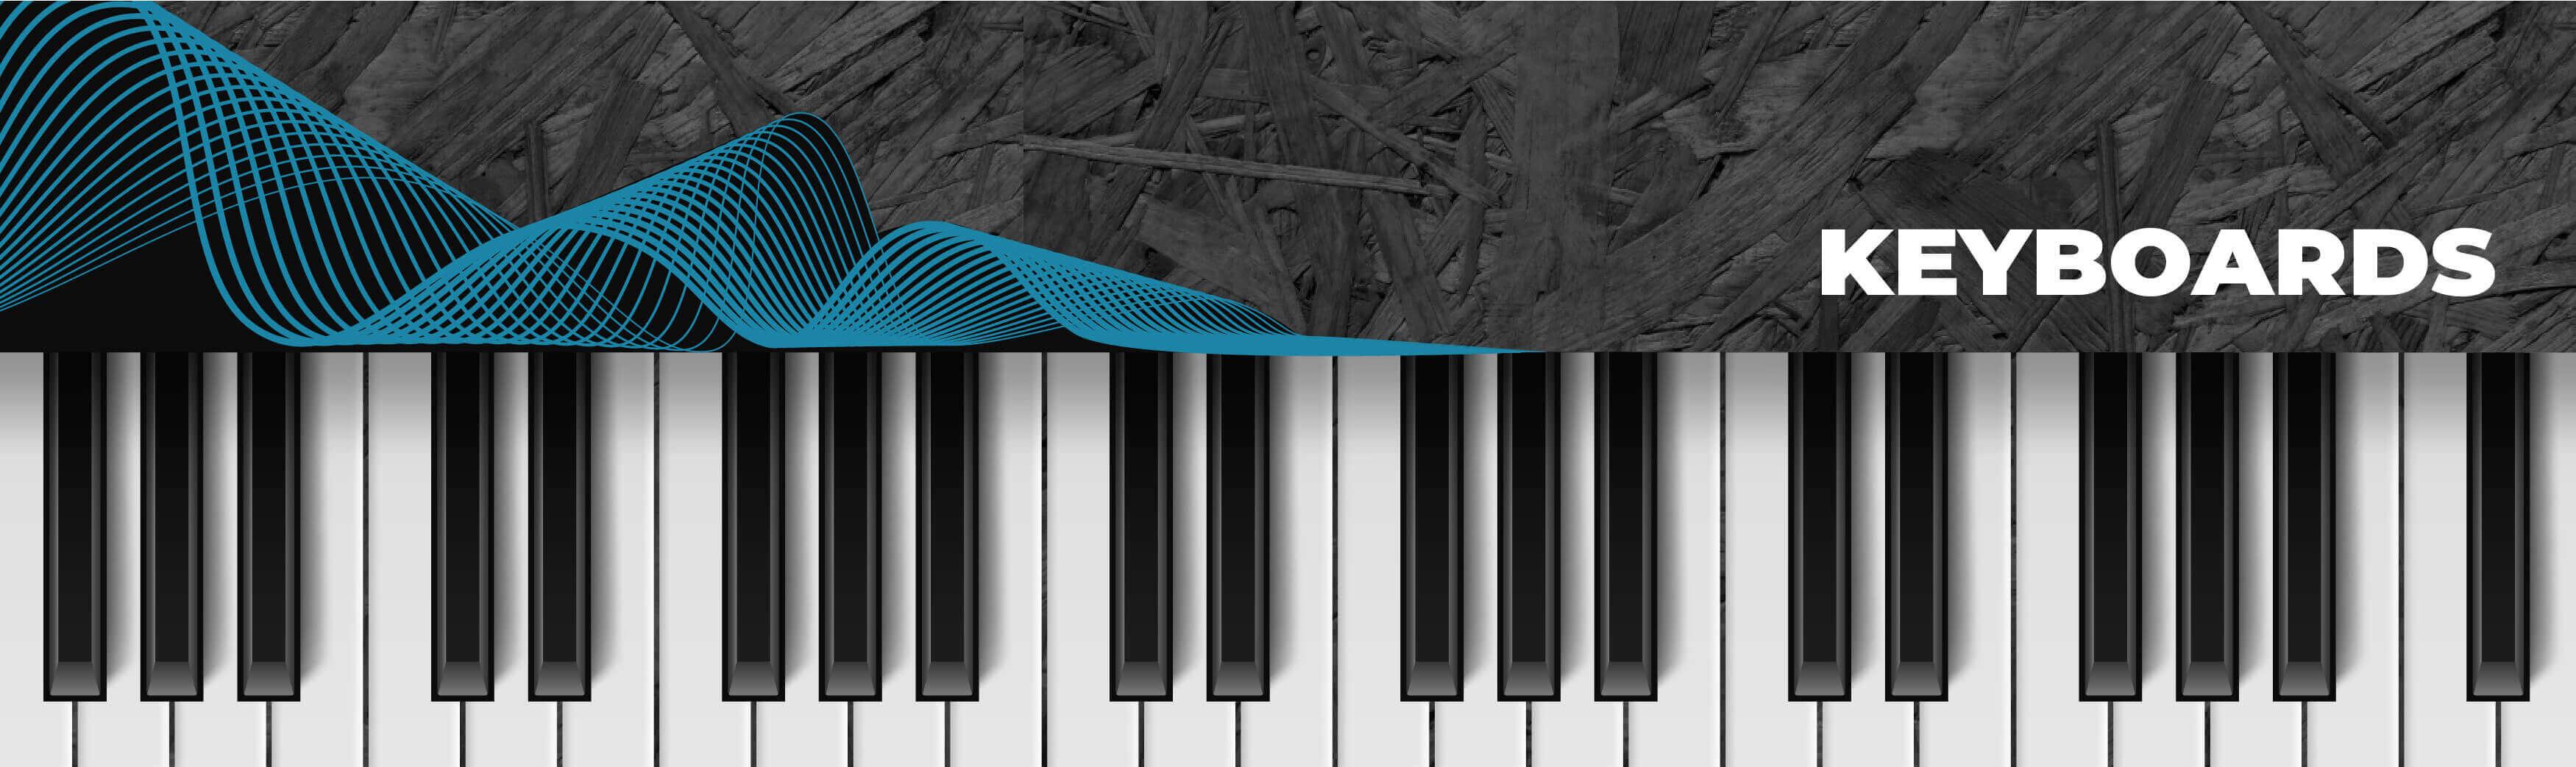 Keyboards for music | Melody House UAE Dubai